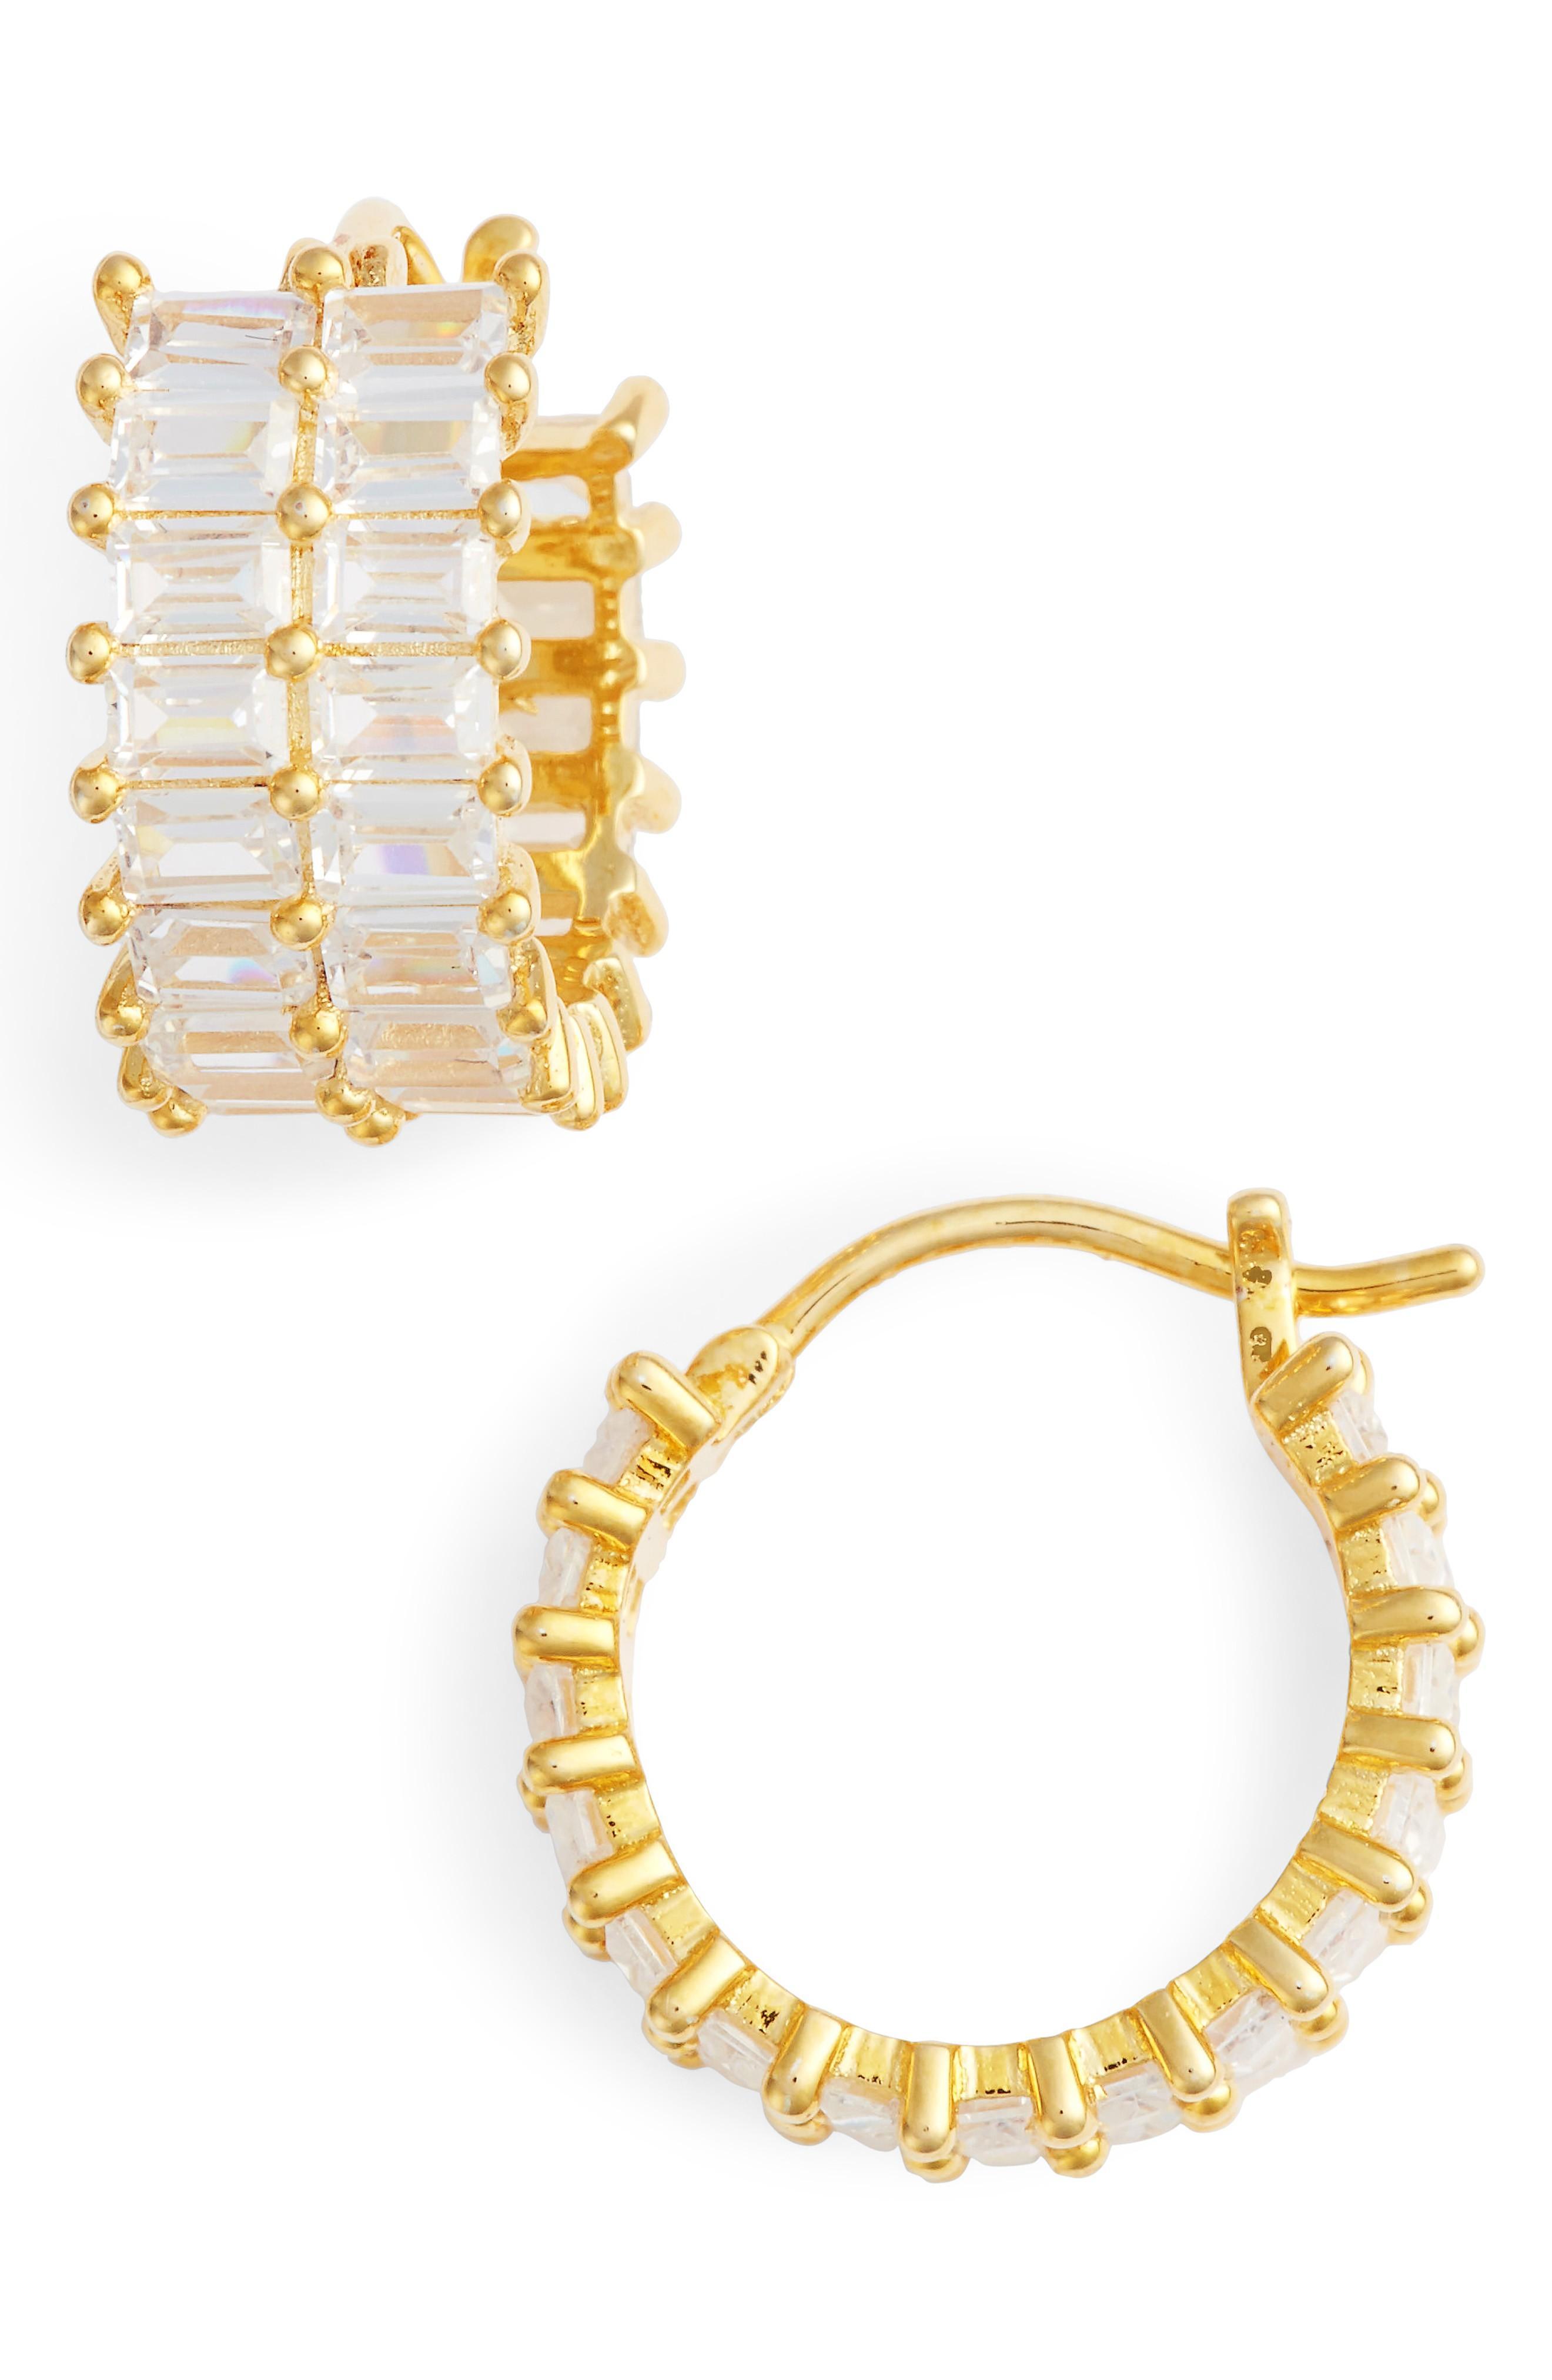 Nina Small Baguette Hoop Earrings In Gold/ White Cz